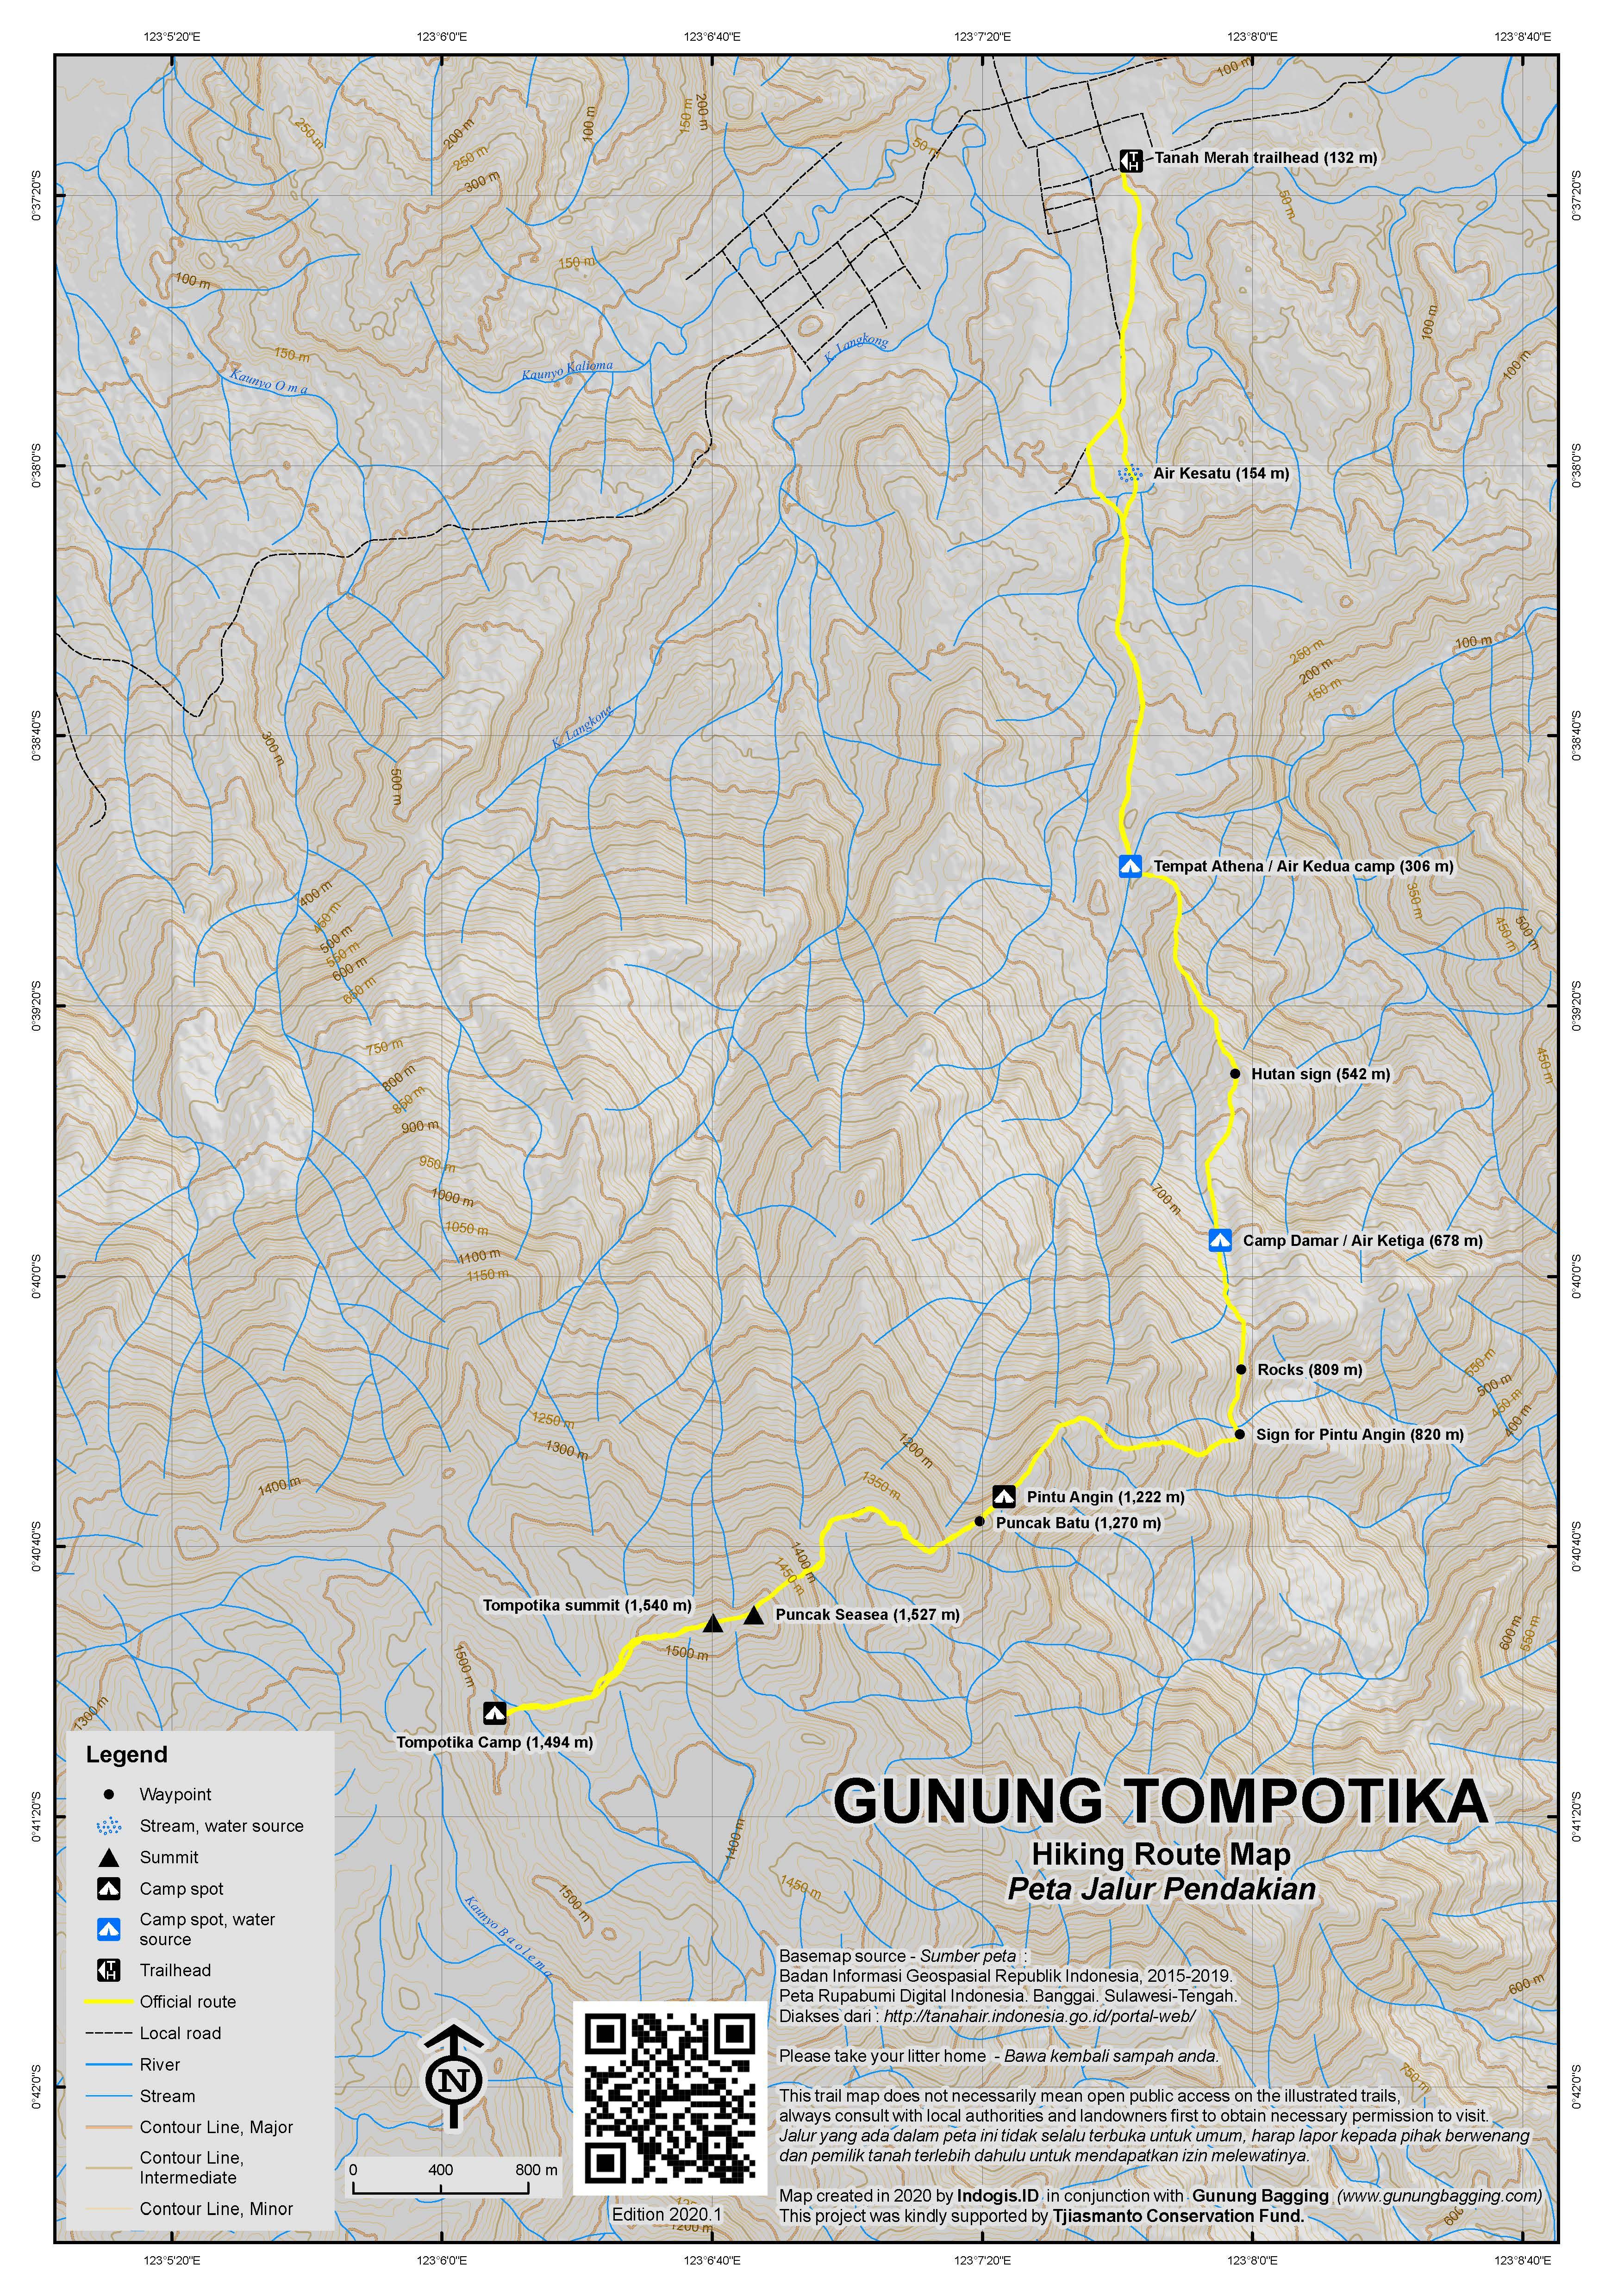 Peta Jalur Pendakian Gunung Tompotika